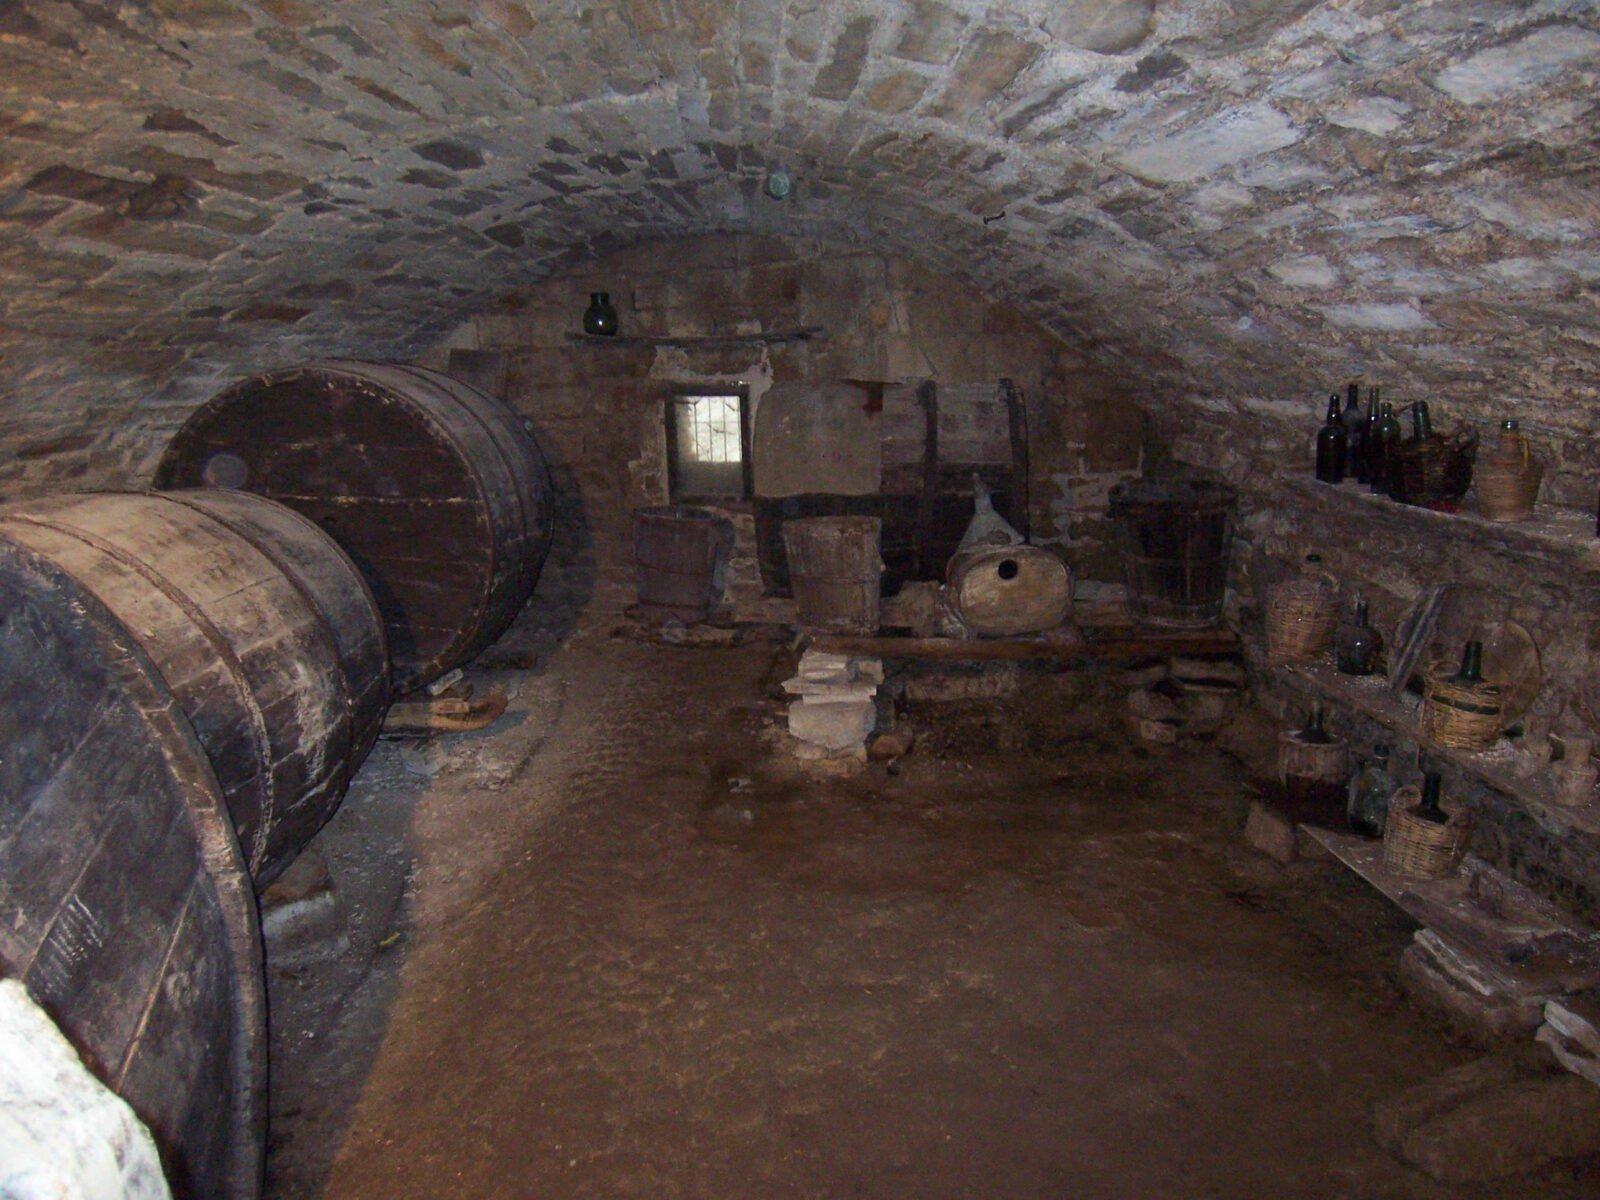 永純酒窖 Wineulove Yong Chun Wine Cellar